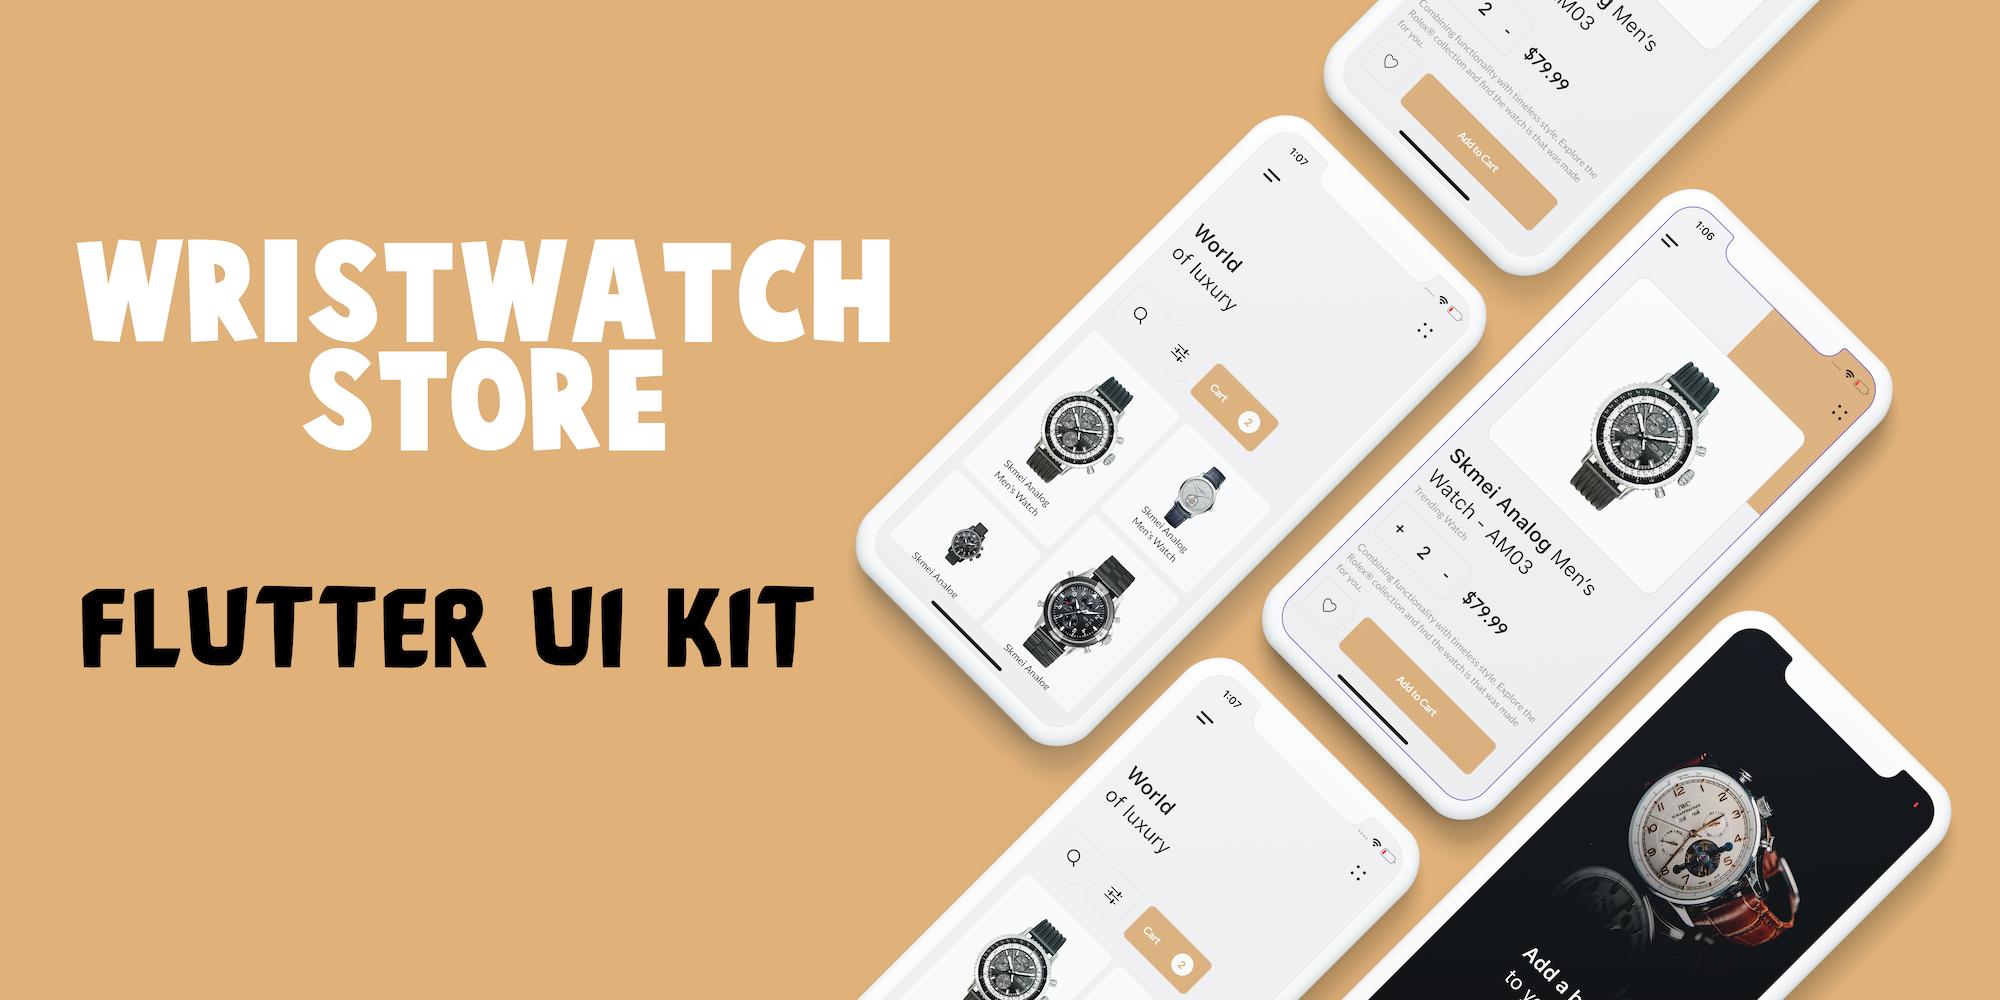 Wrist Watch Store UI Kit